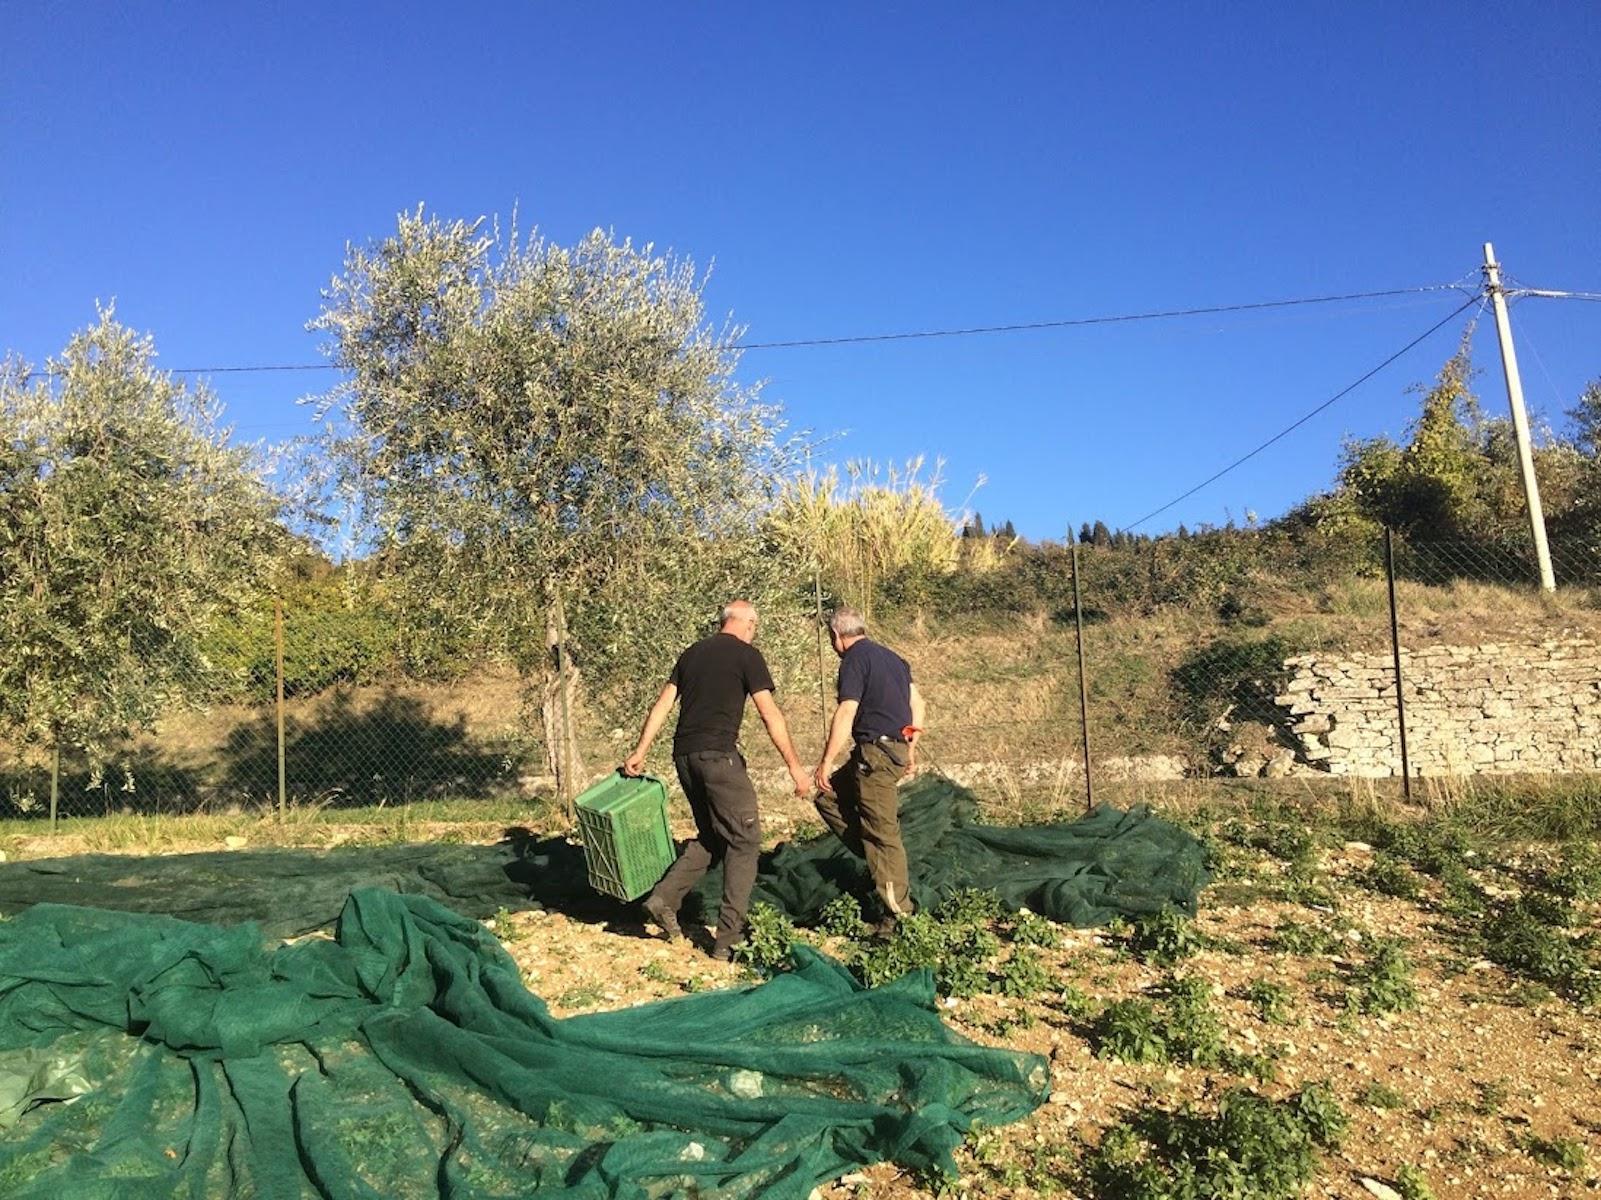 Harvesting olives at Florence Villa Violetta by Florence